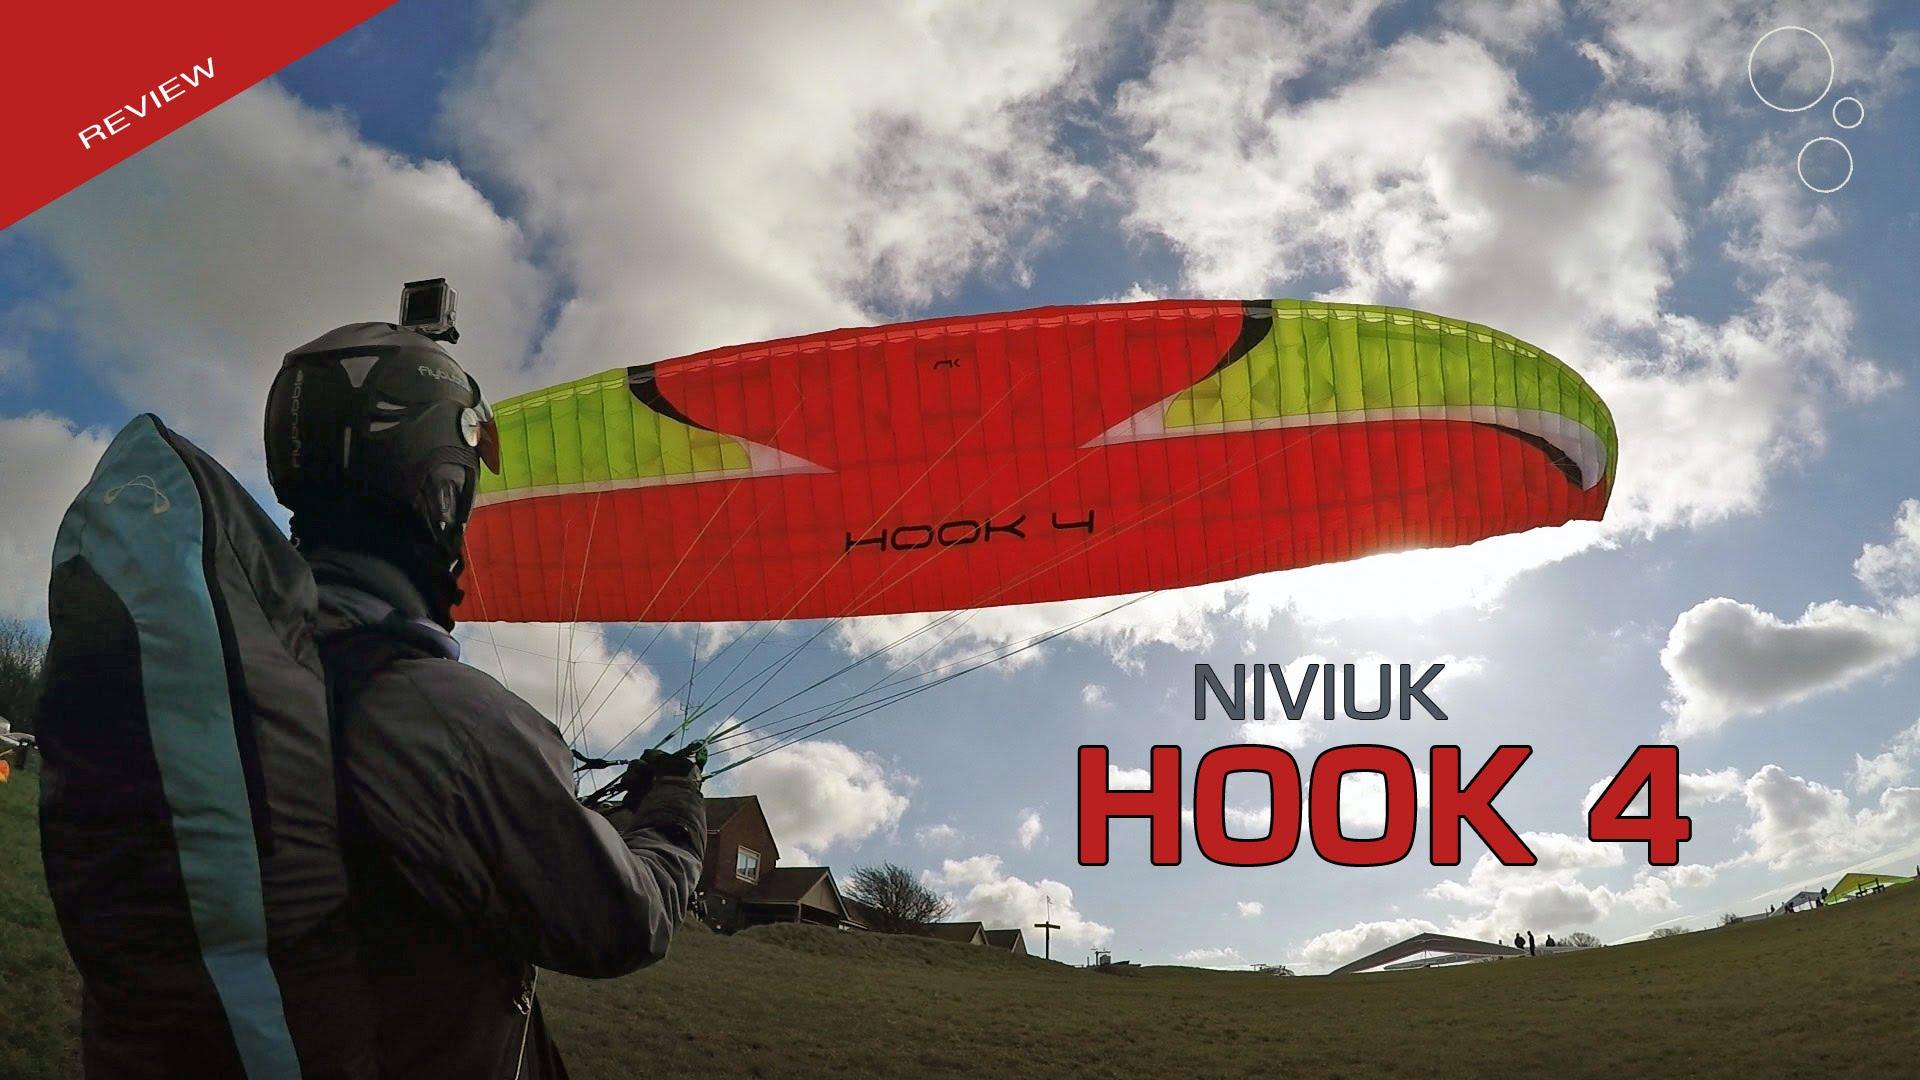 Niviuk Hook 4 1